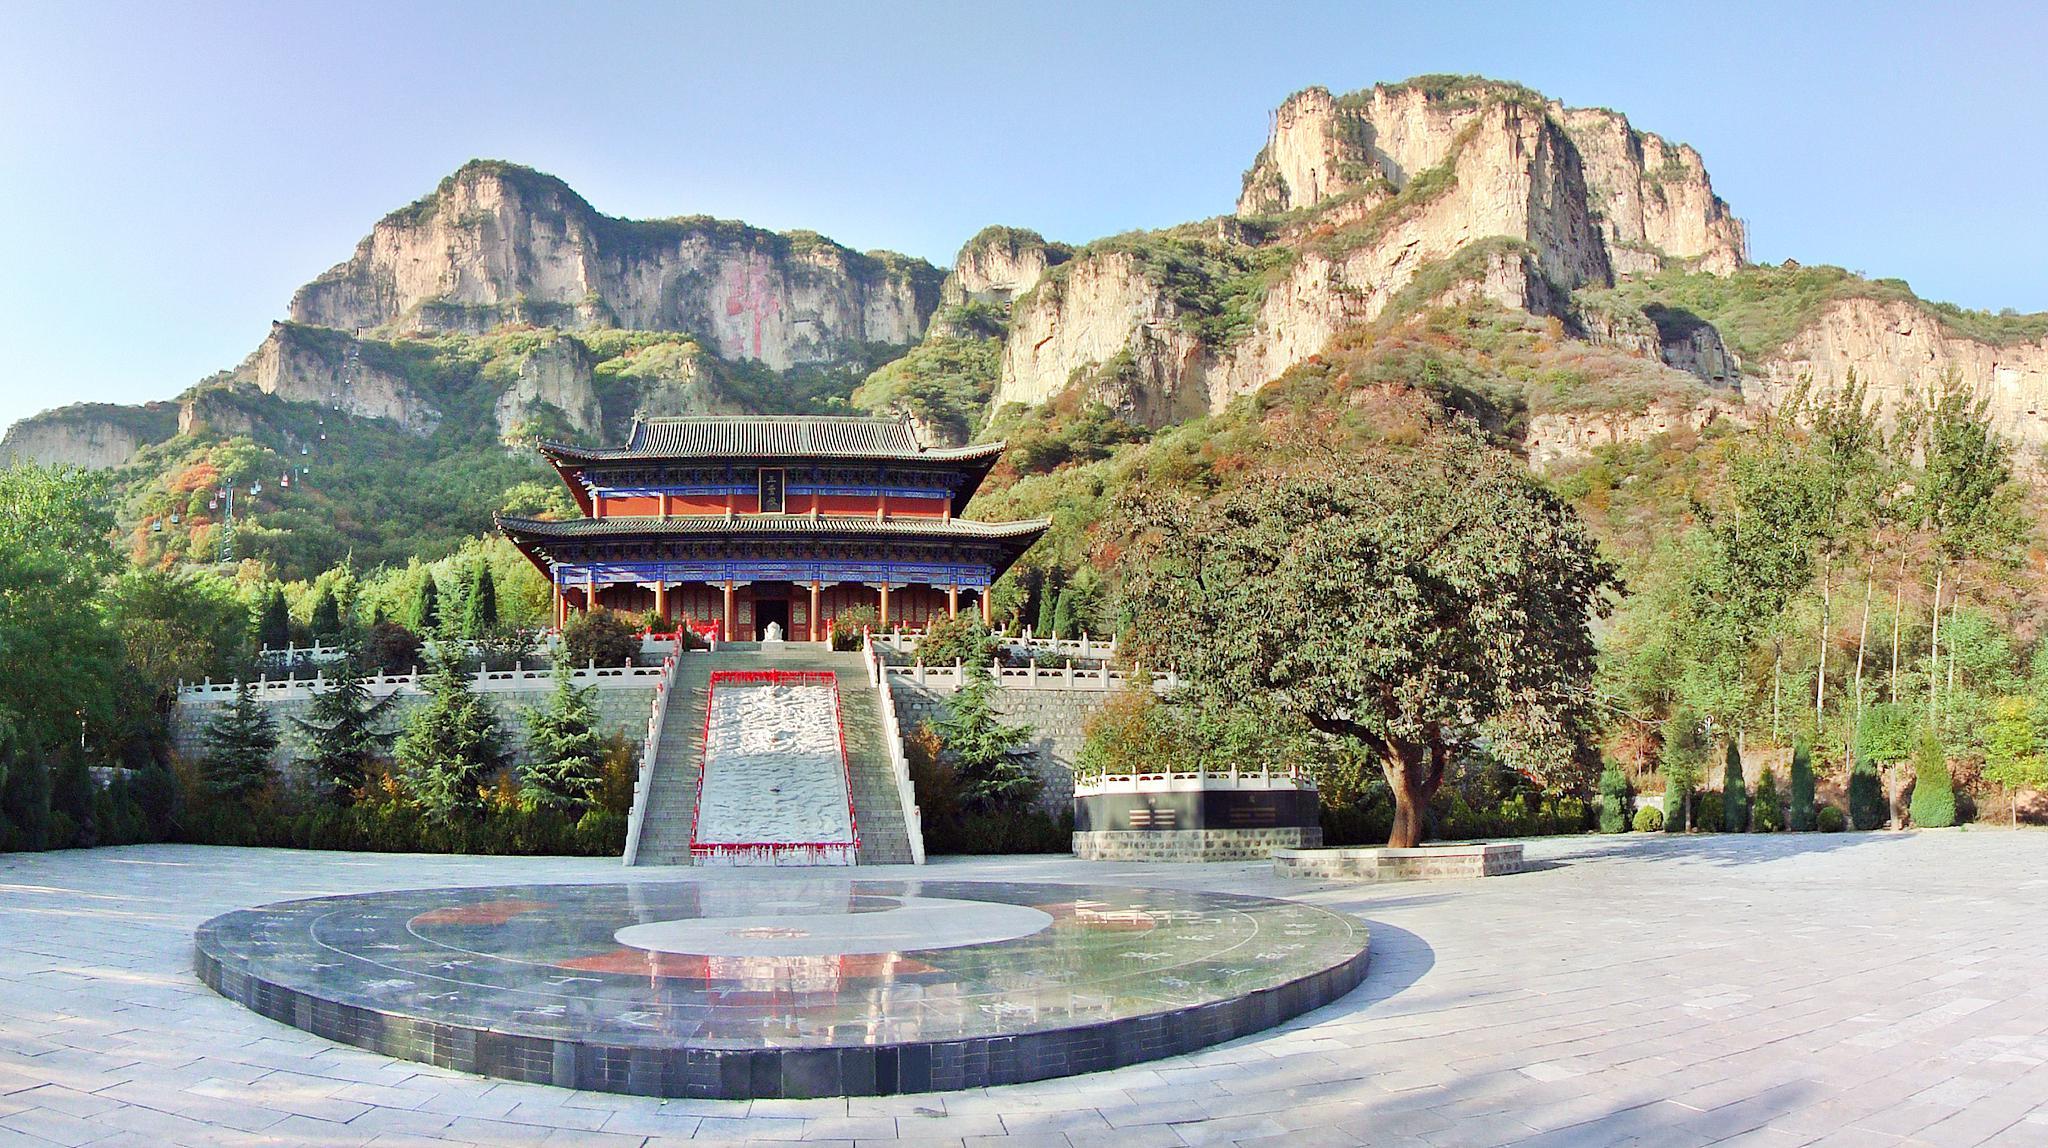 Tiangui Mountain Scenic Area